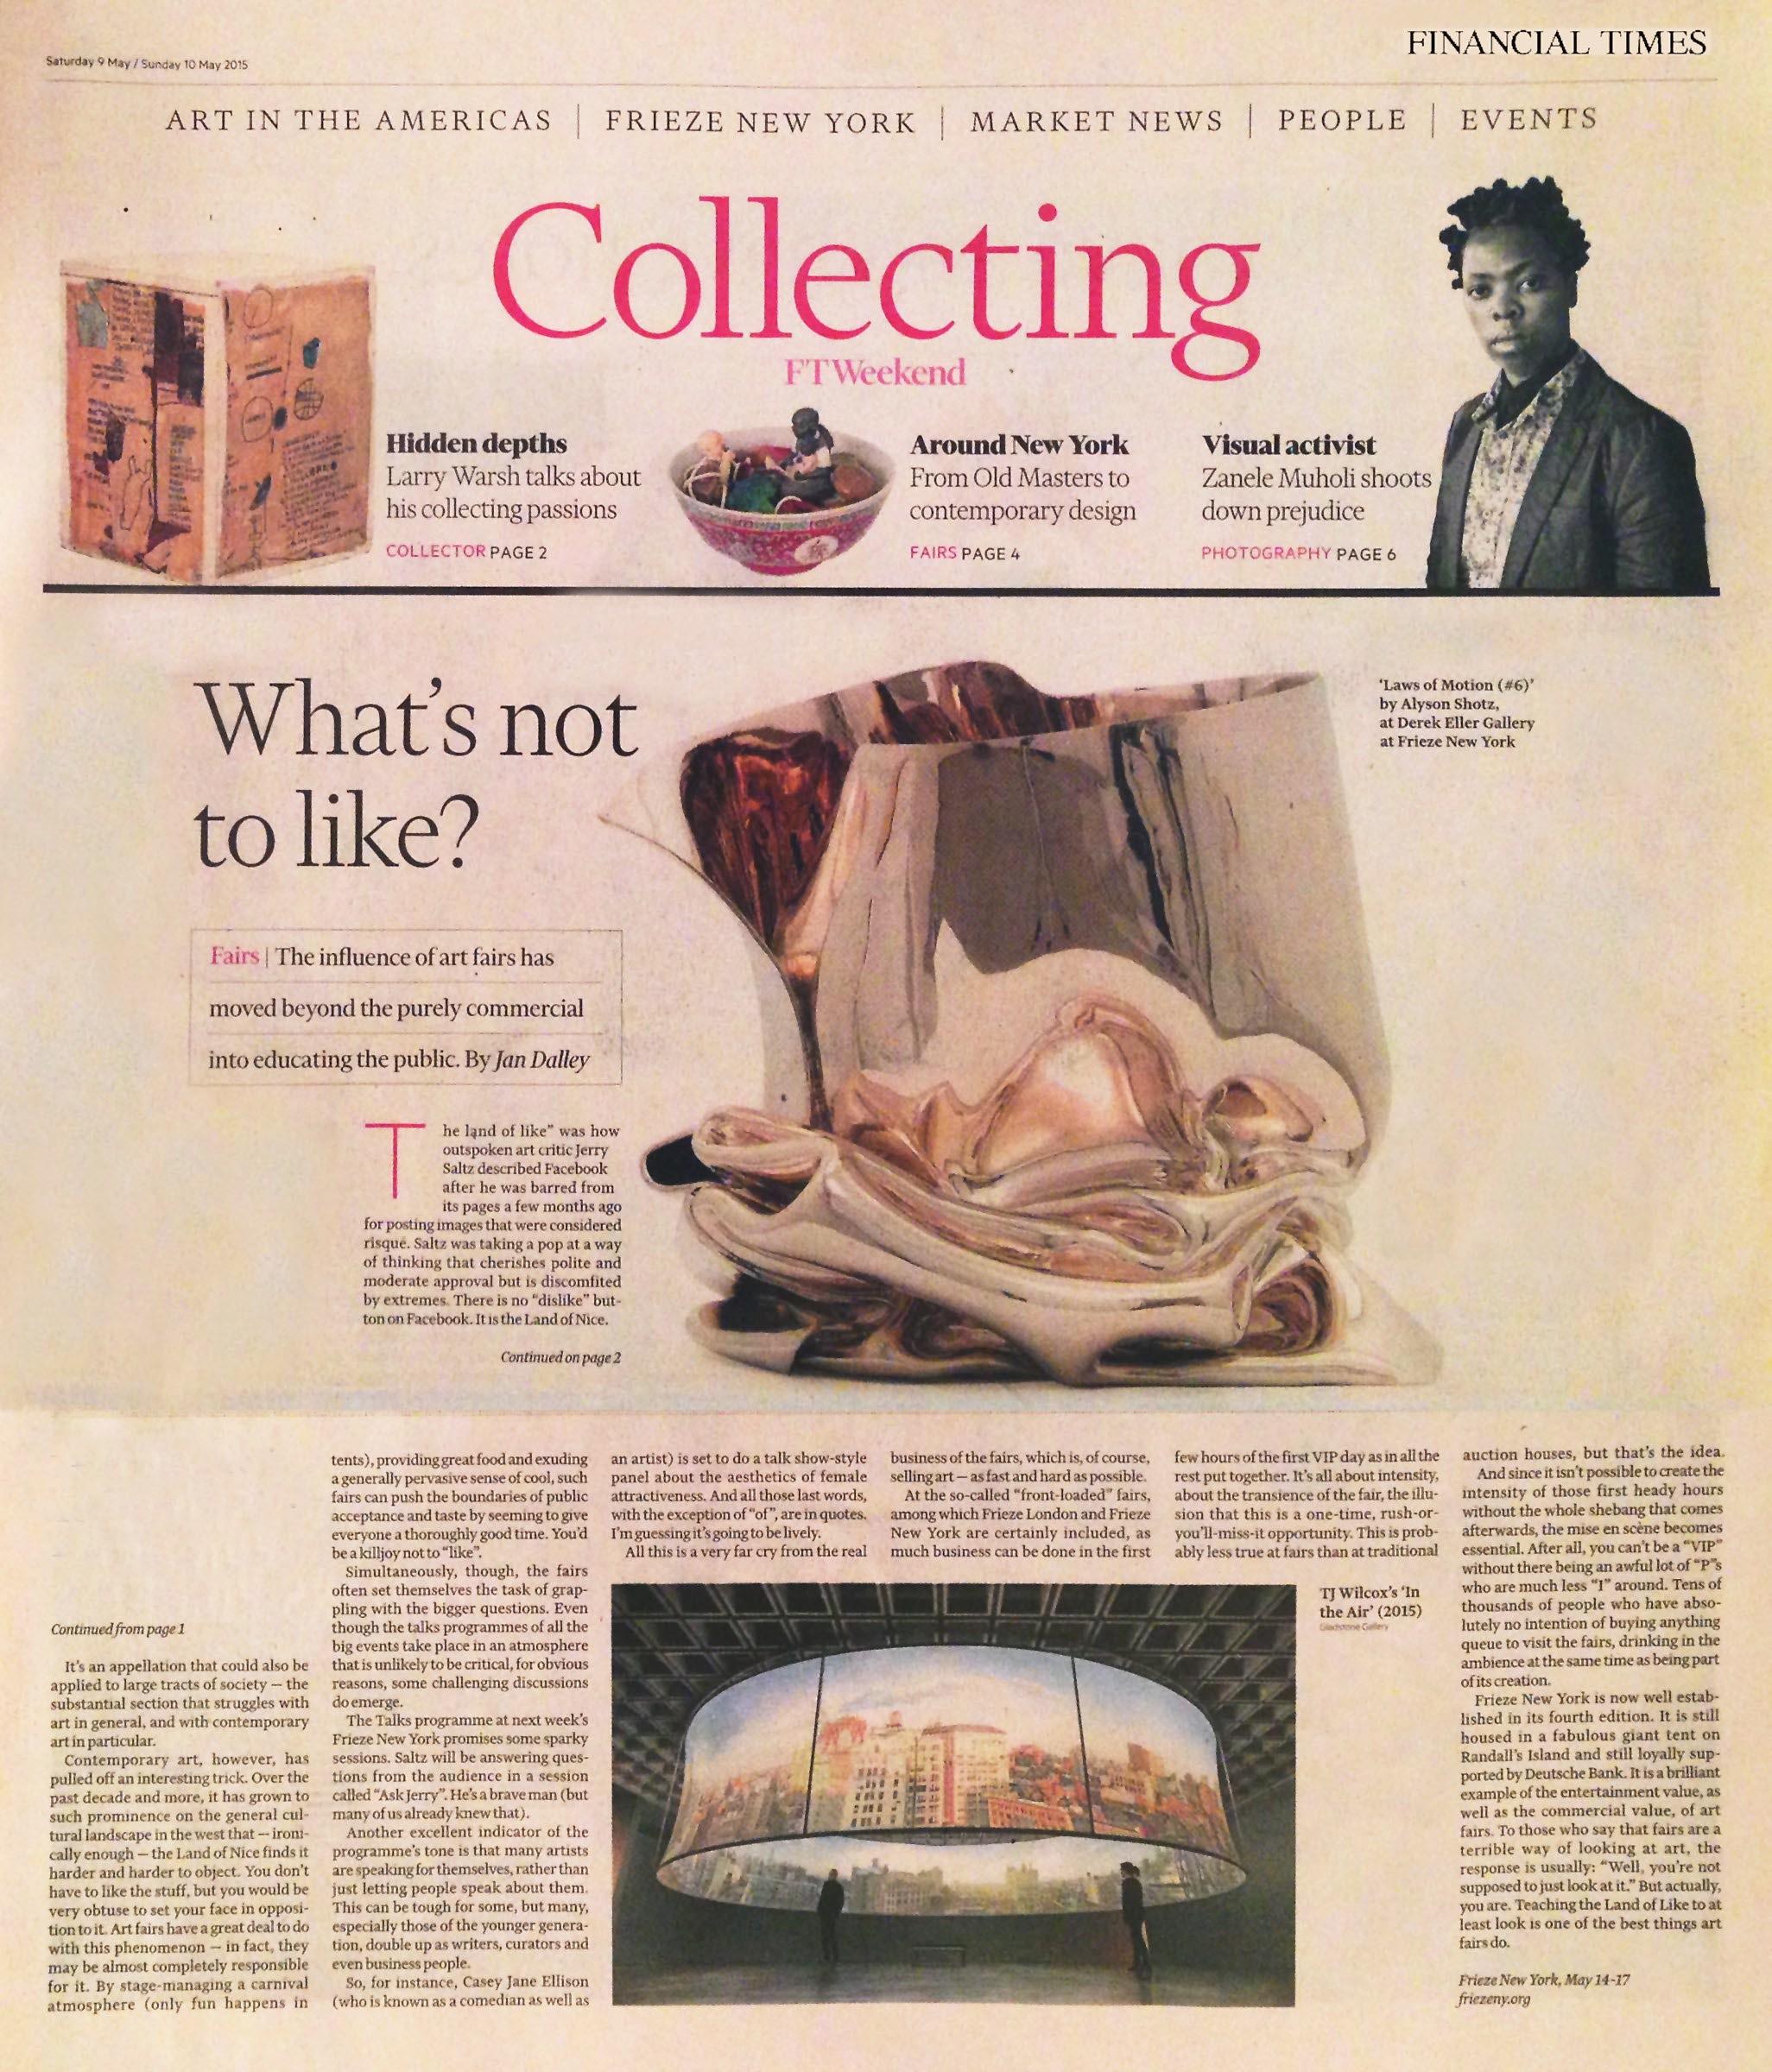 Financial Times: May, 2015